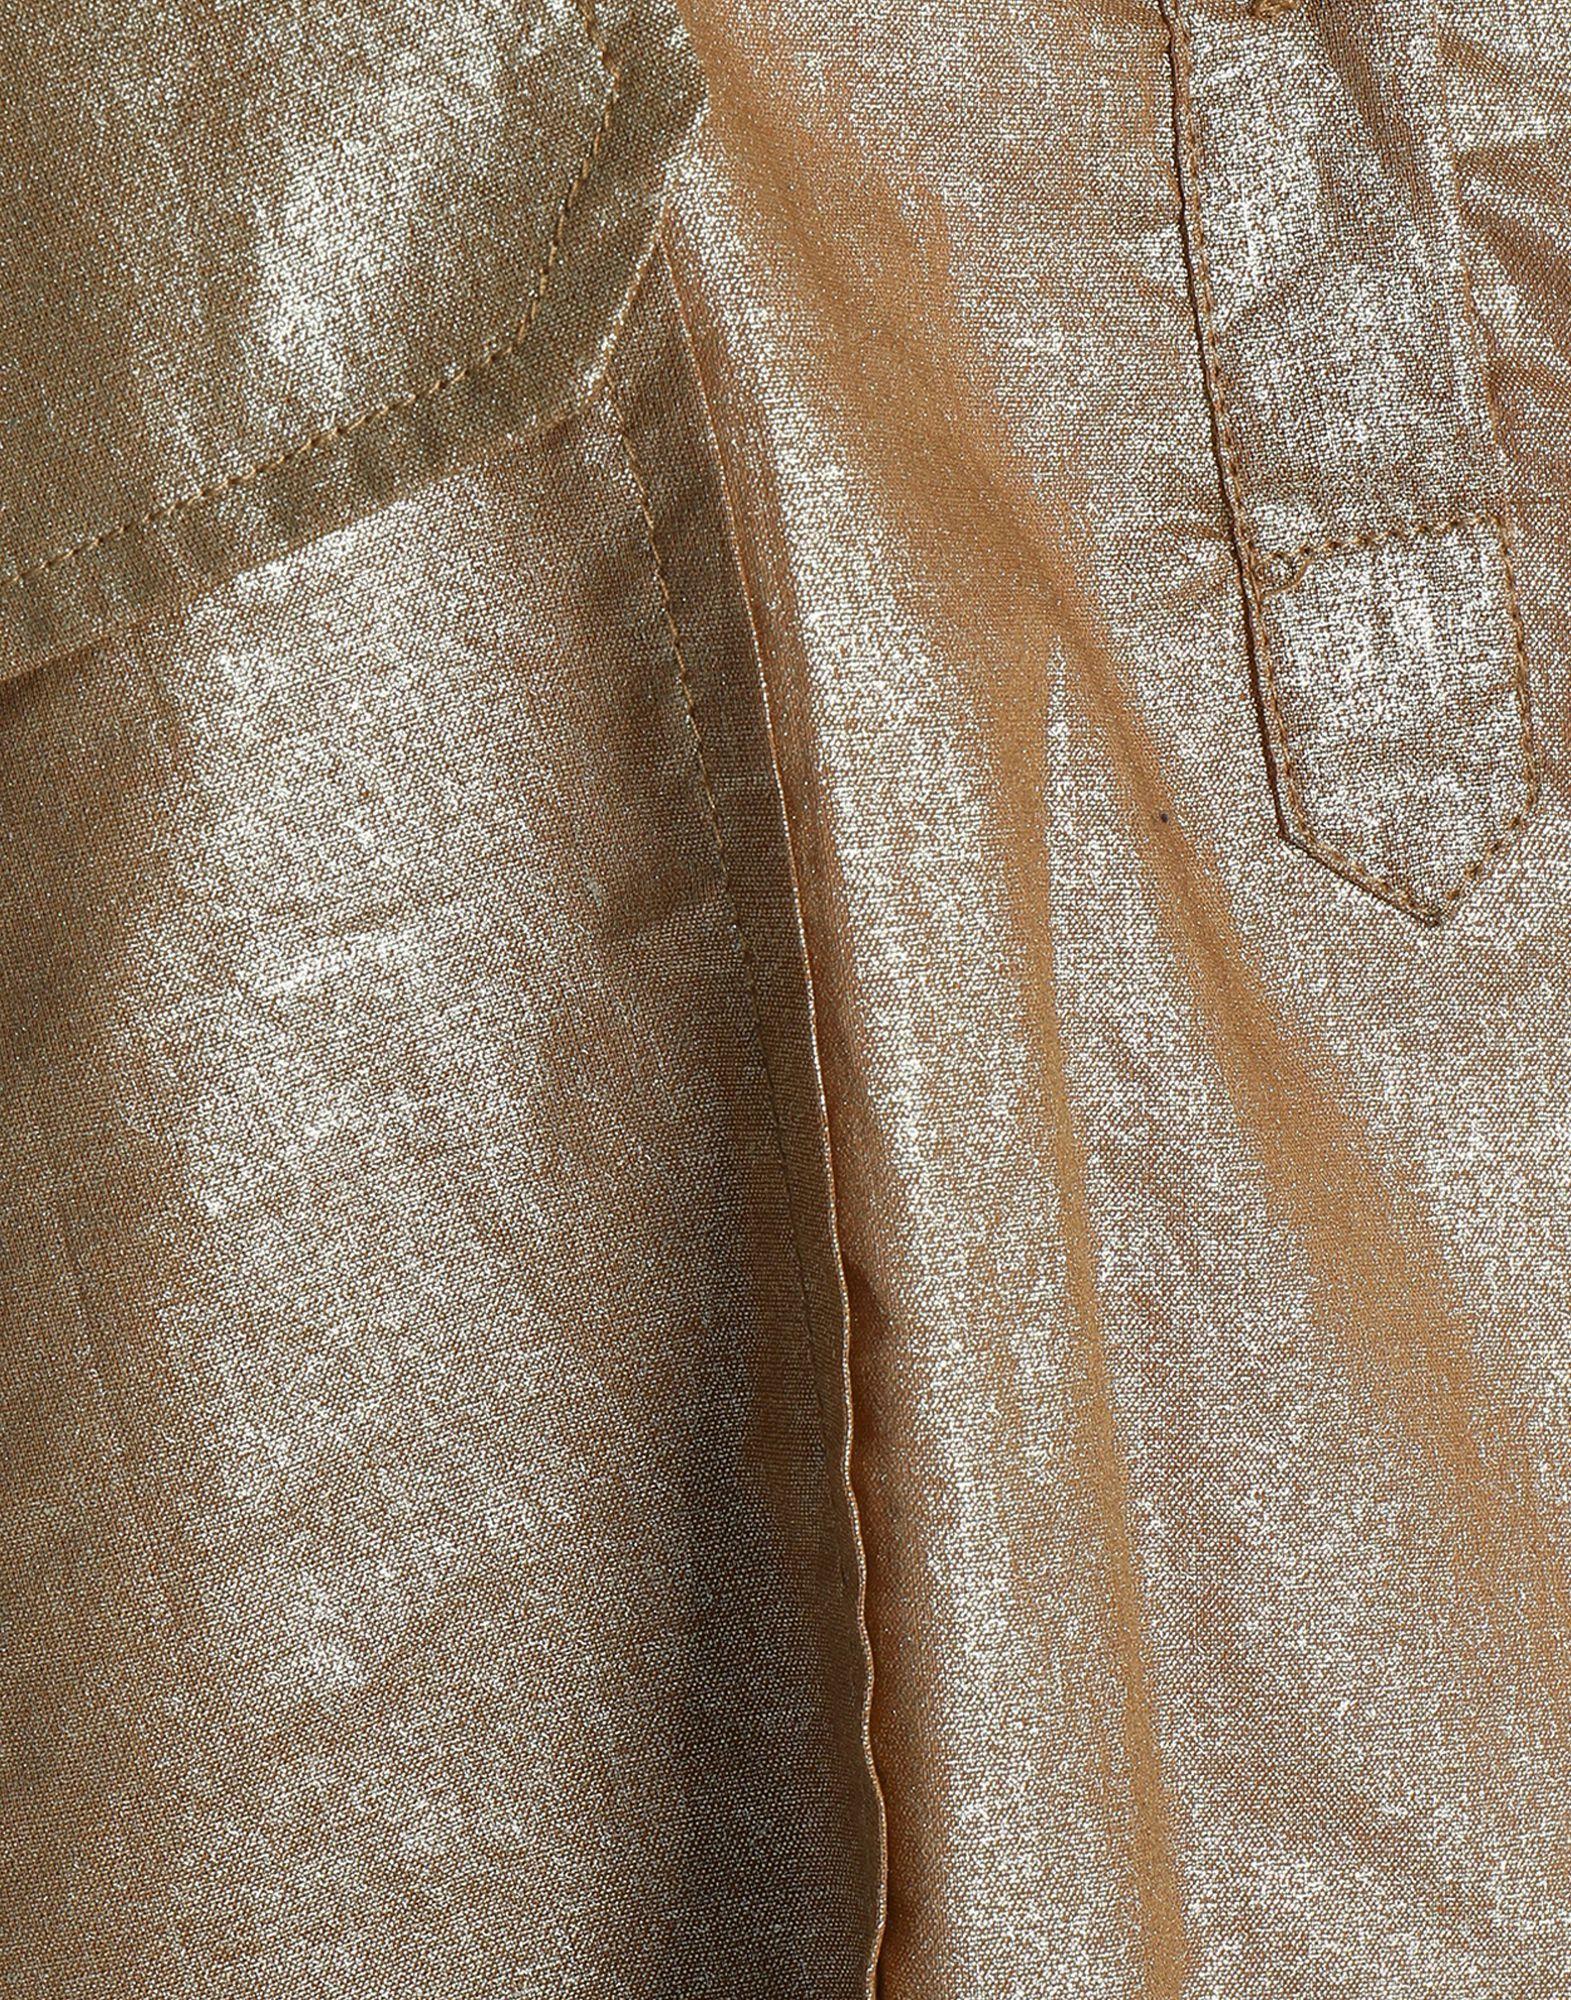 Antik Batik Khaki Laminated Effect Cotton Shirt